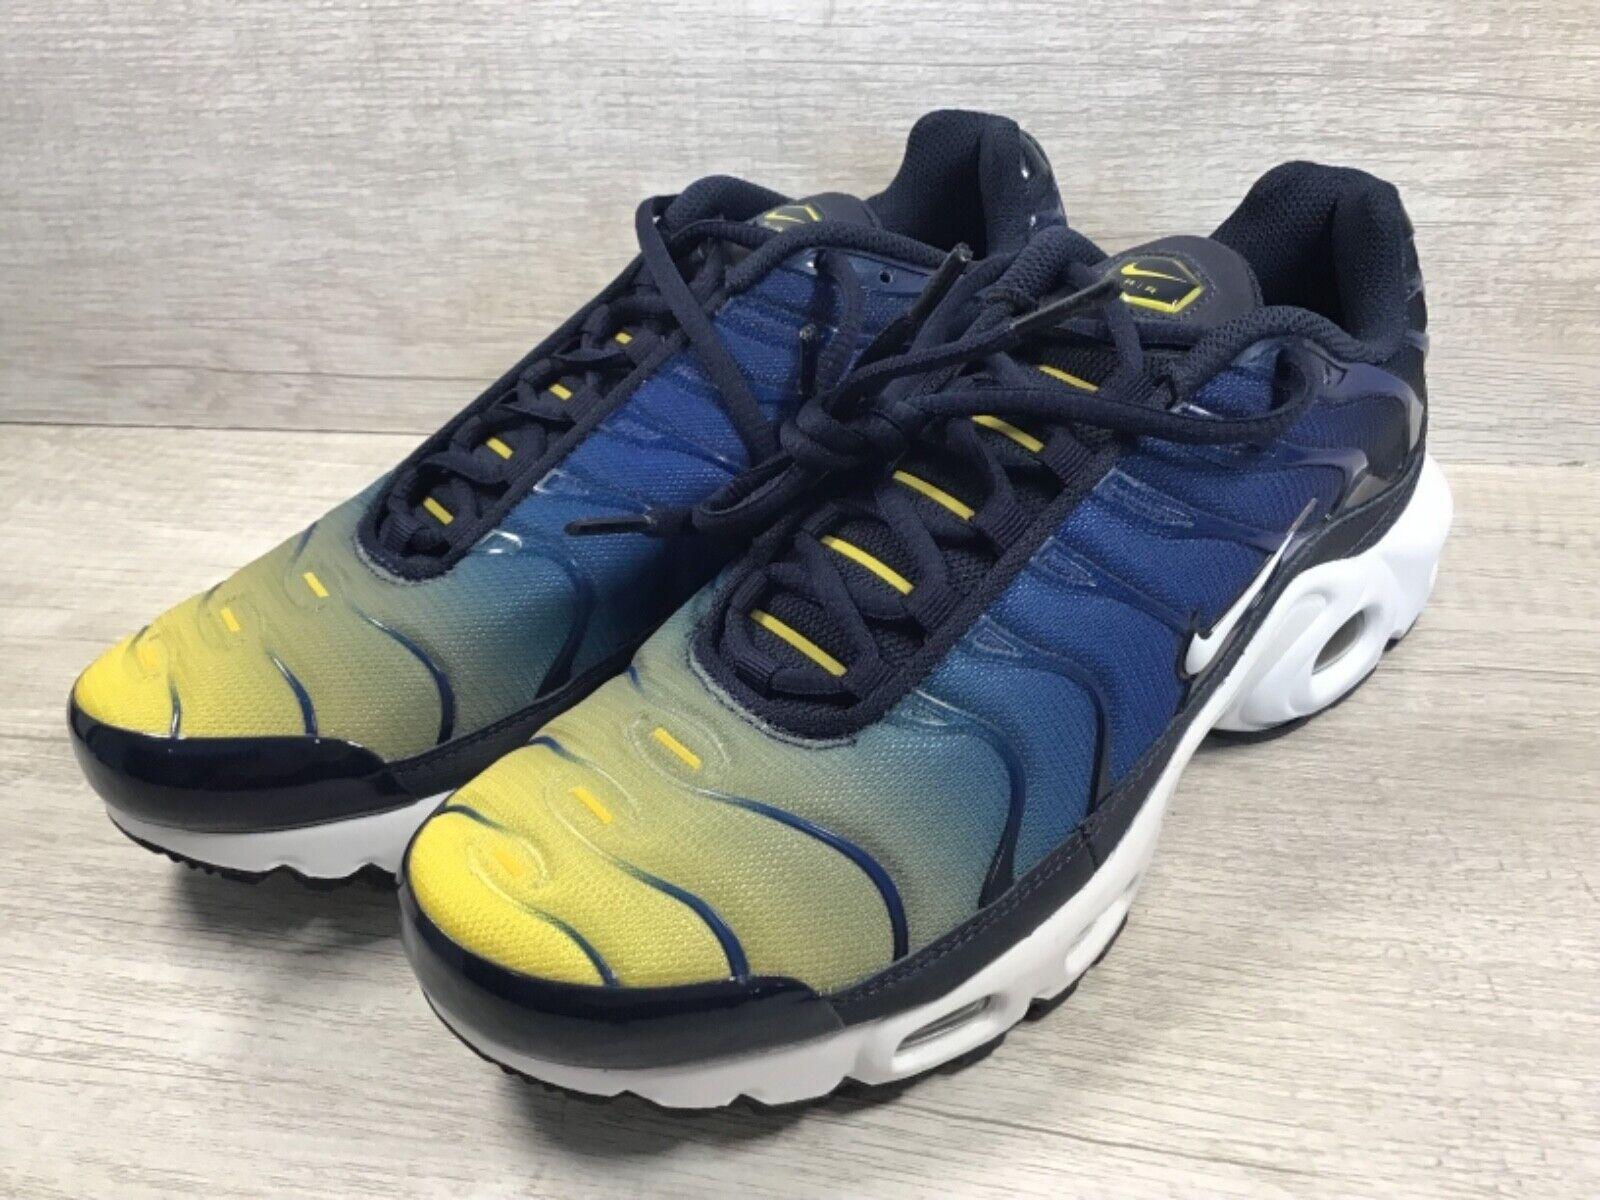 4ebb18fd6f Men's Nike Air Max Plus TN Gradient Running shoes. bluee Yellow 852630-407  SZ